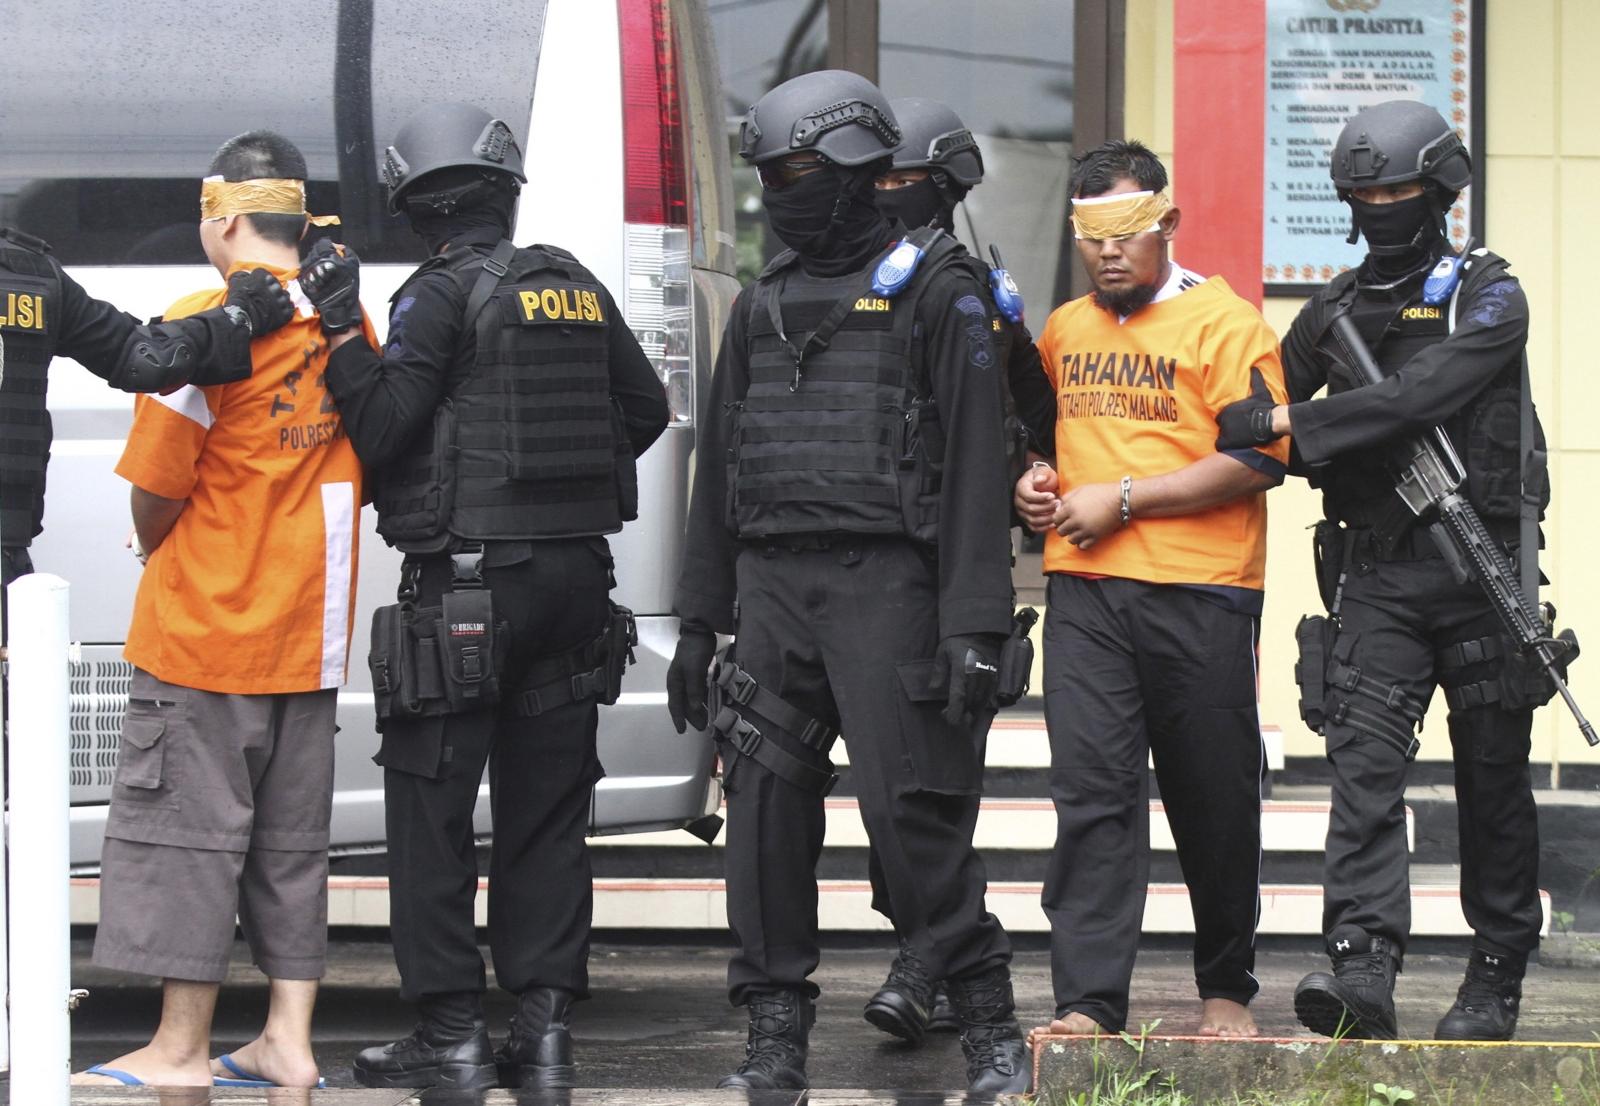 Indonesia Police Detain 140 Men in Gay Club